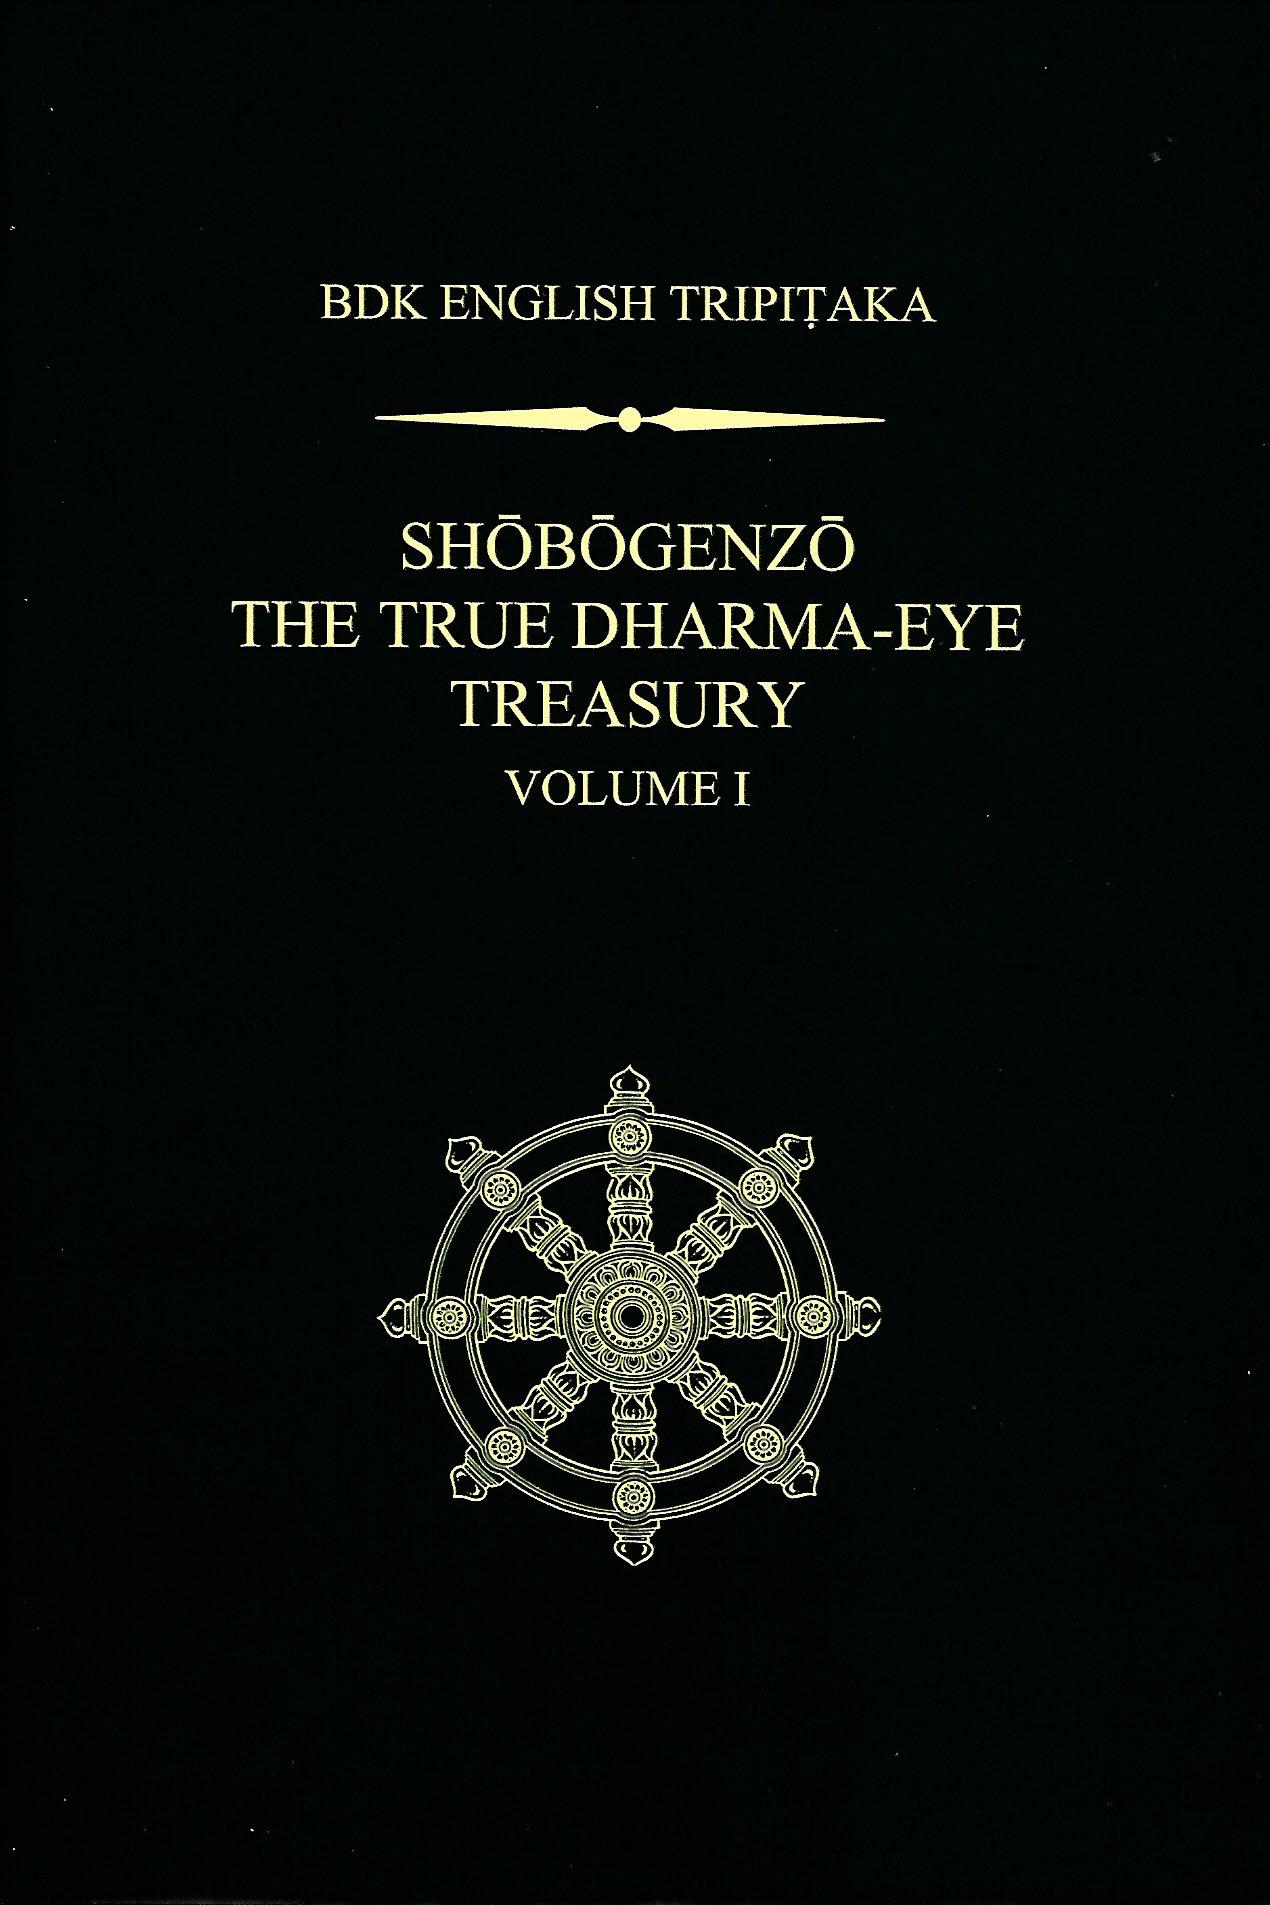 Shobogenzo Nishijima and Cross Volume 1 cover art